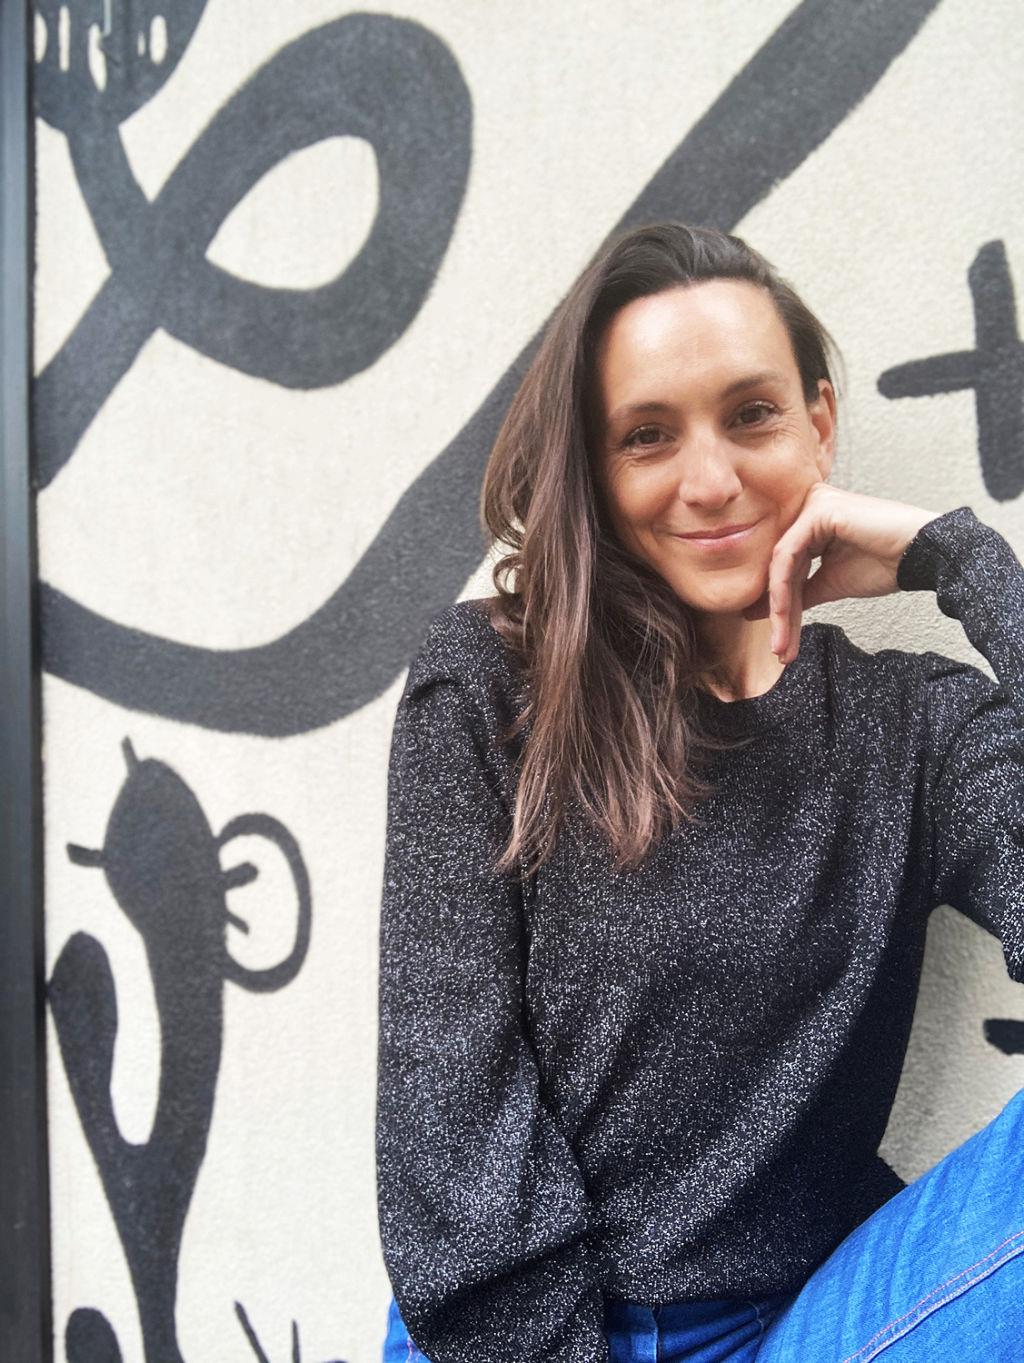 Hey Murals founder Shannon Lamden